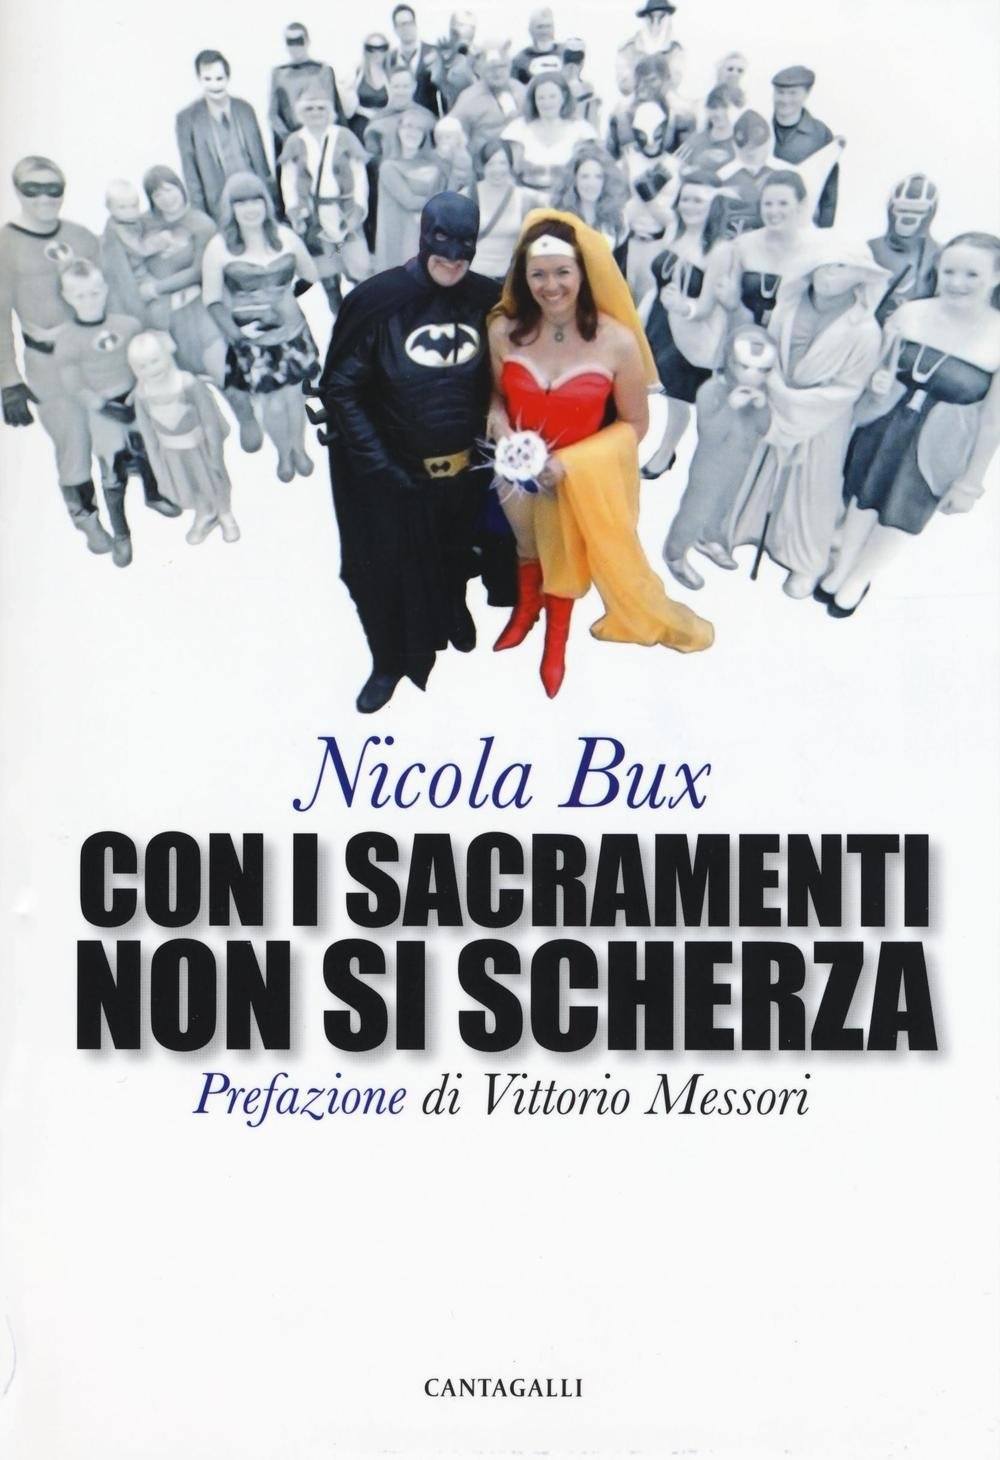 Con i sacramenti non si scherza (Amazon) - Mons. Nicola Bux